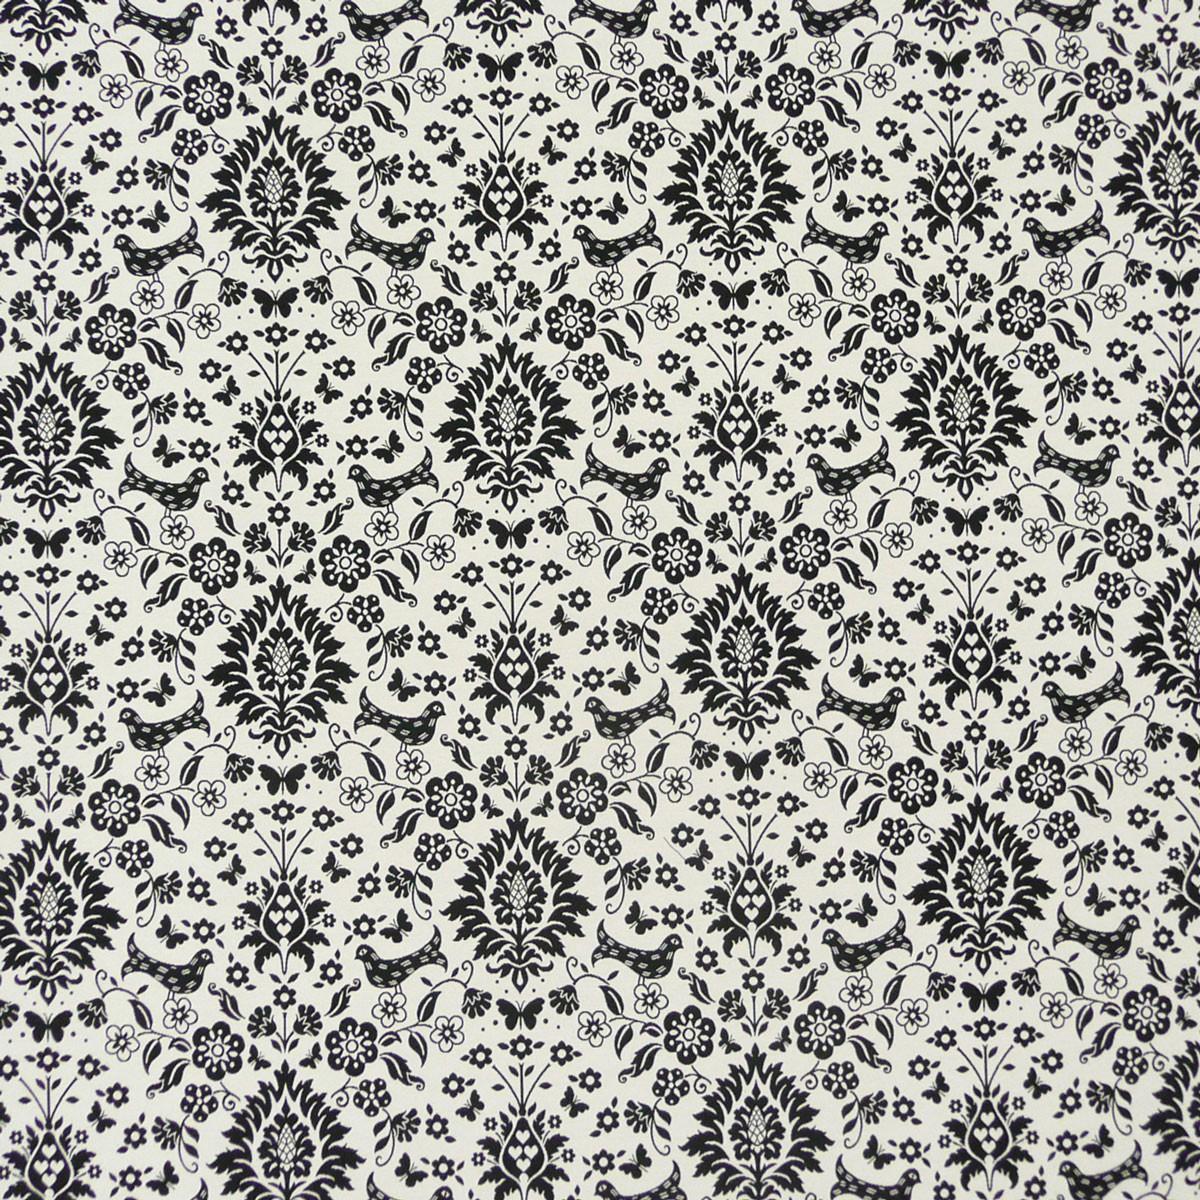 dekostoff wendestoff meterware vogel ornament schwarz wei alle stoffe stoffe gemustert stoff. Black Bedroom Furniture Sets. Home Design Ideas